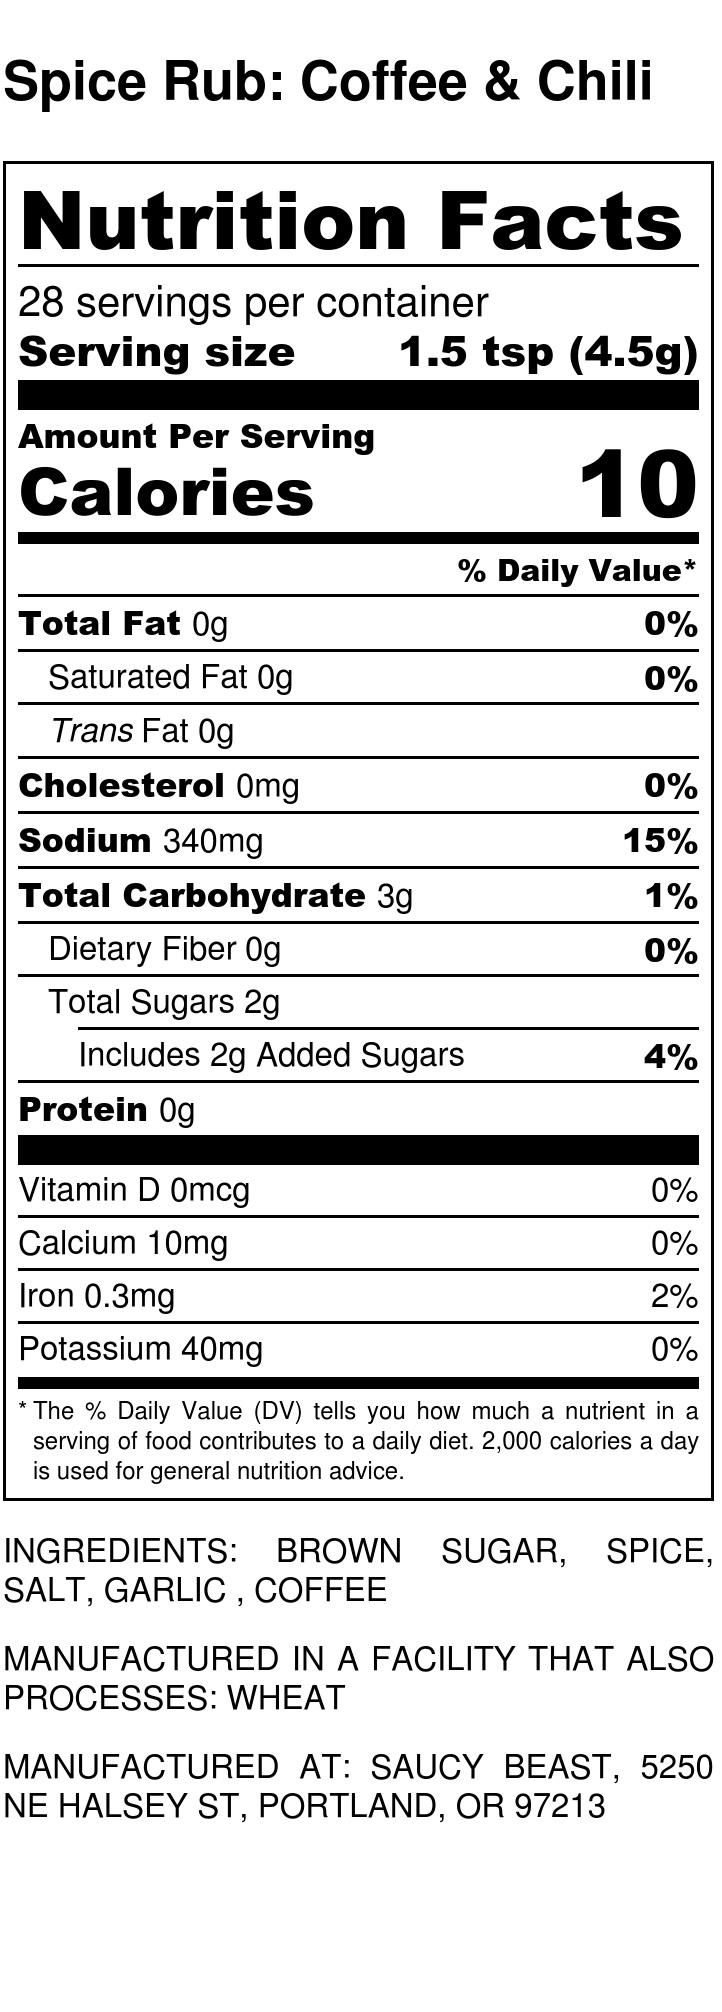 Spice Rub_ Coffee & Chili - Nutrition Label.jpg